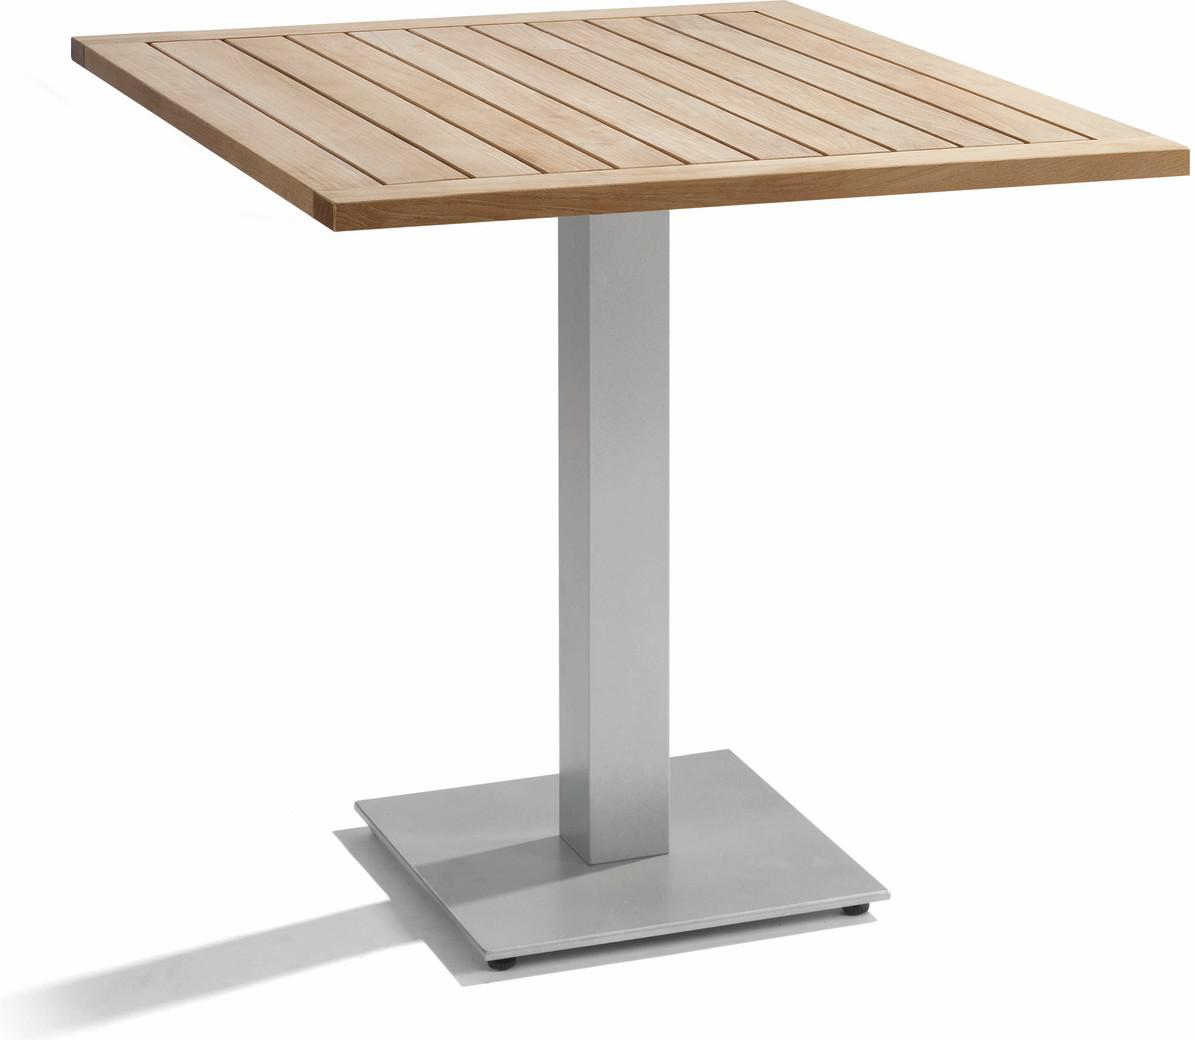 Napoli Bistro table - shingle - Teak 75